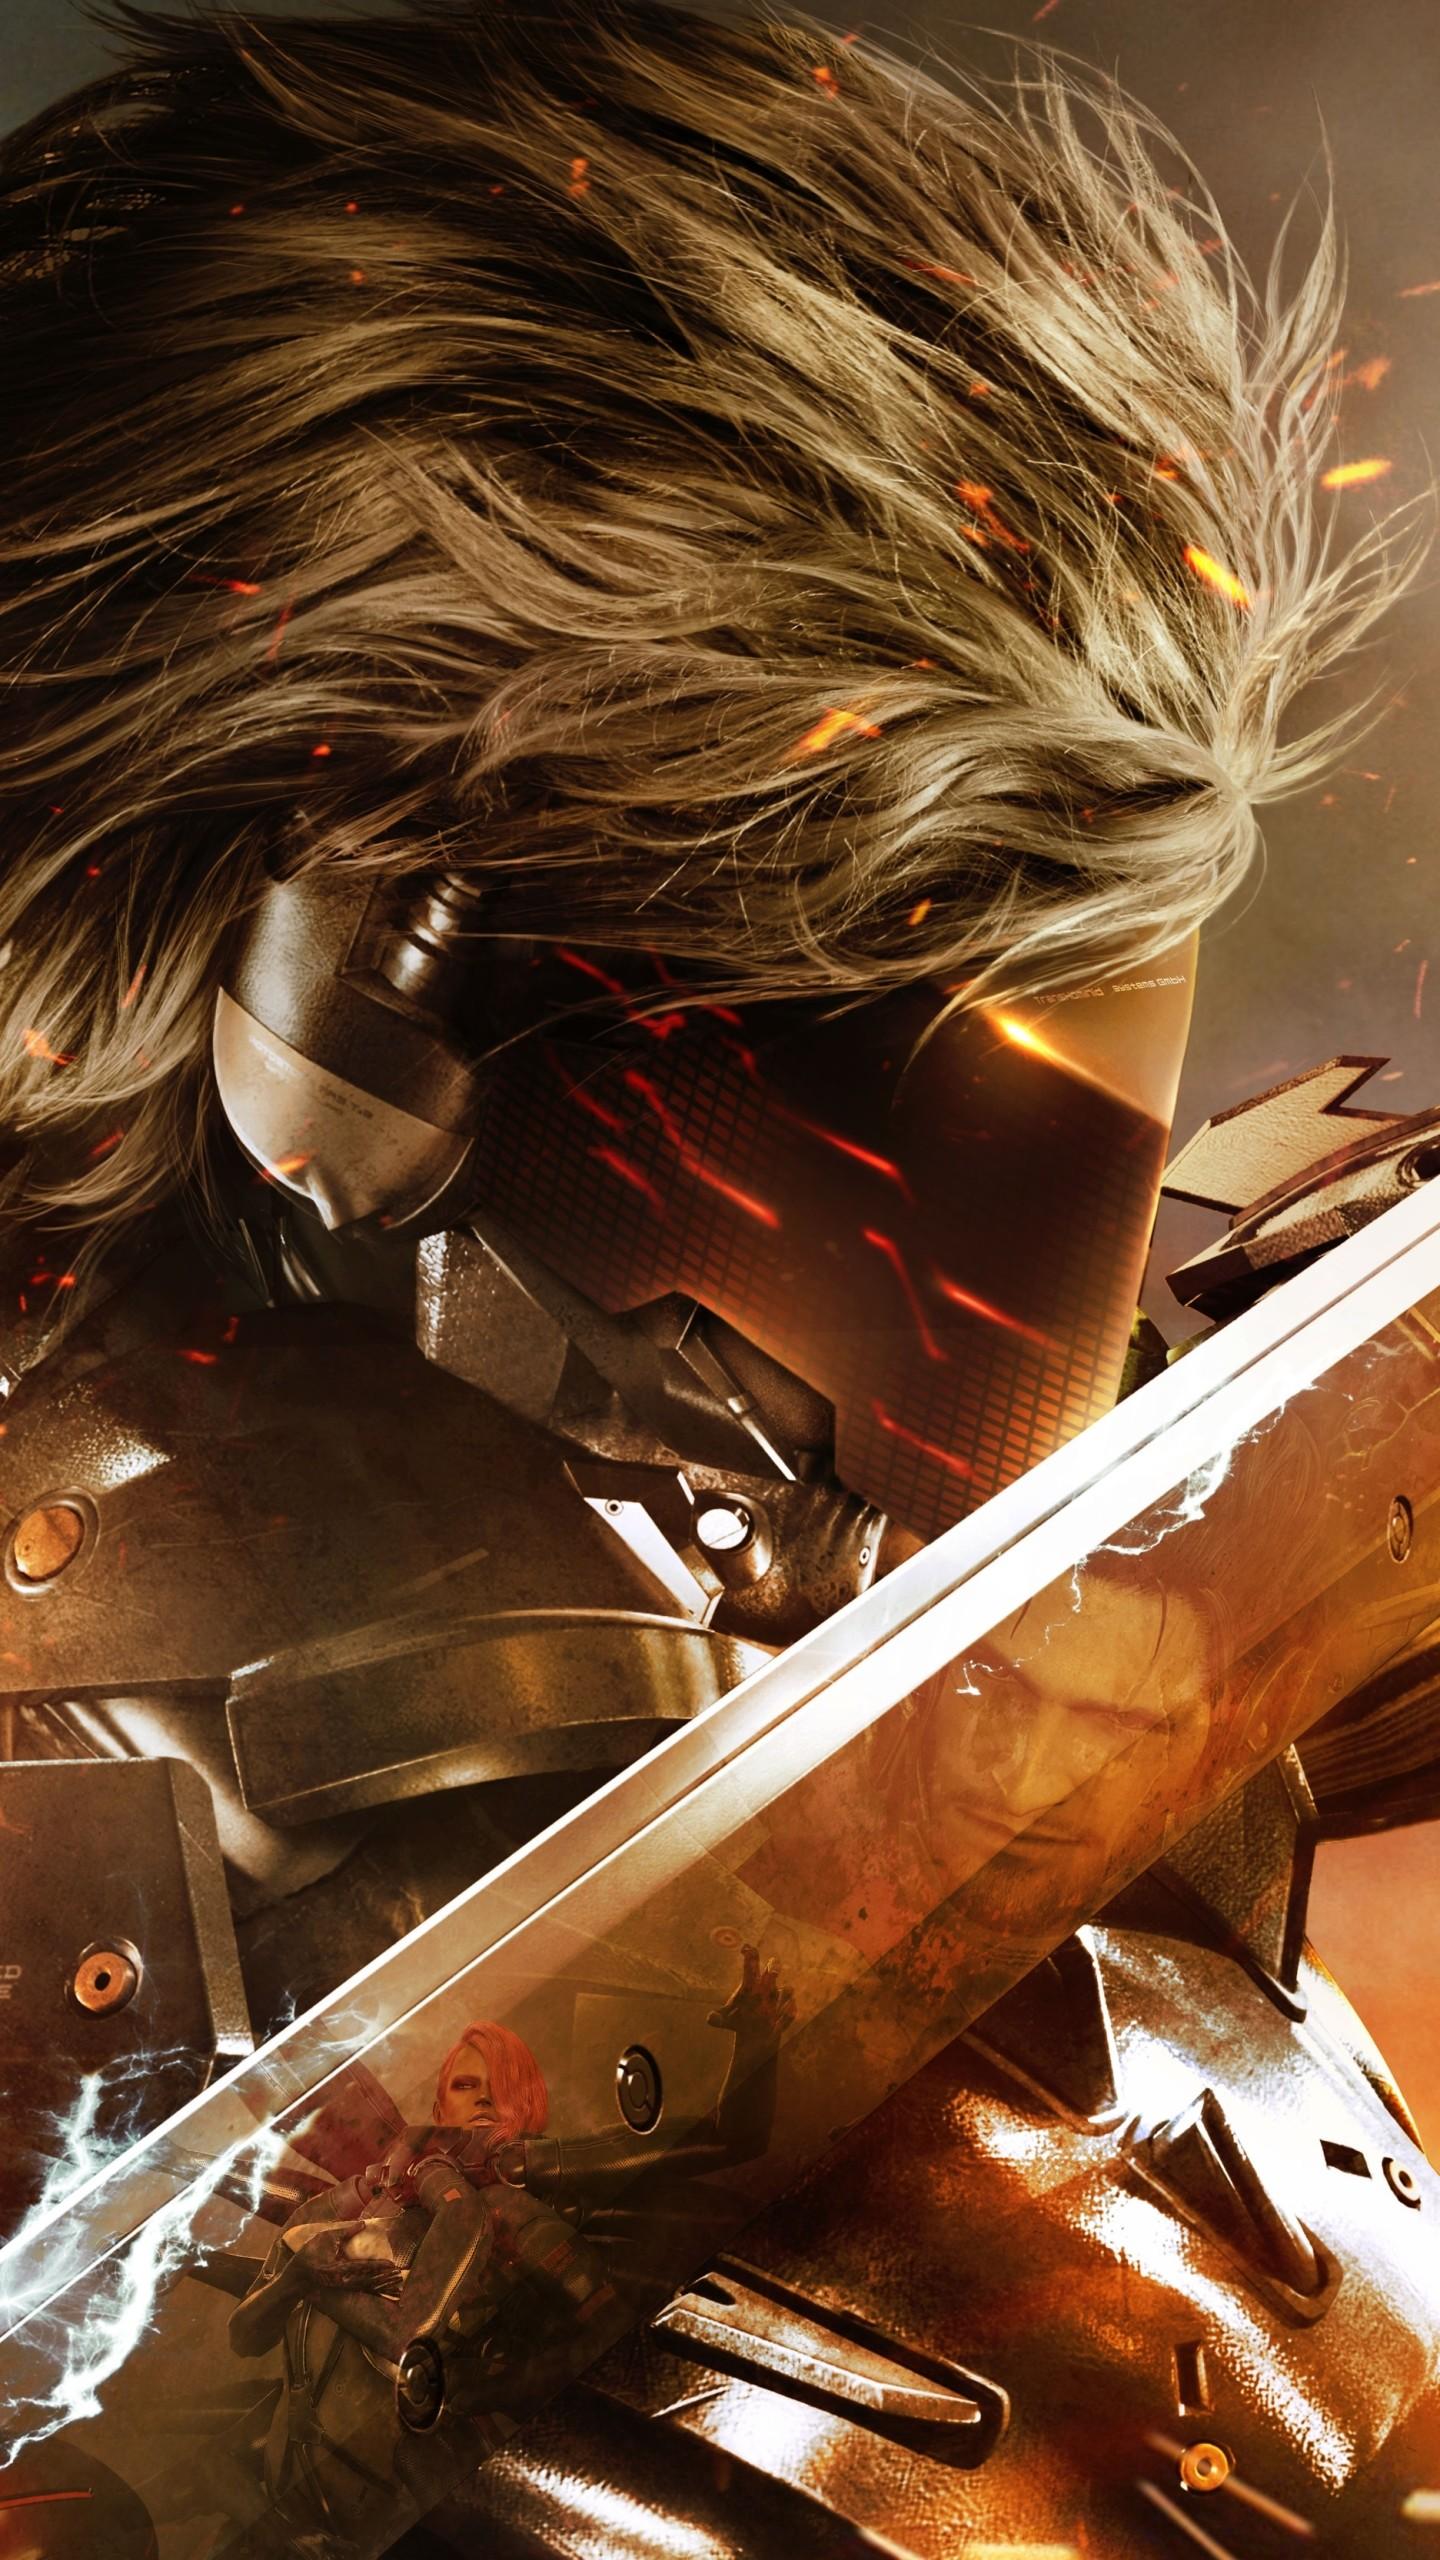 Video Game Metal Gear Rising: Revengeance Metal Gear Solid Mobile Wallpaper